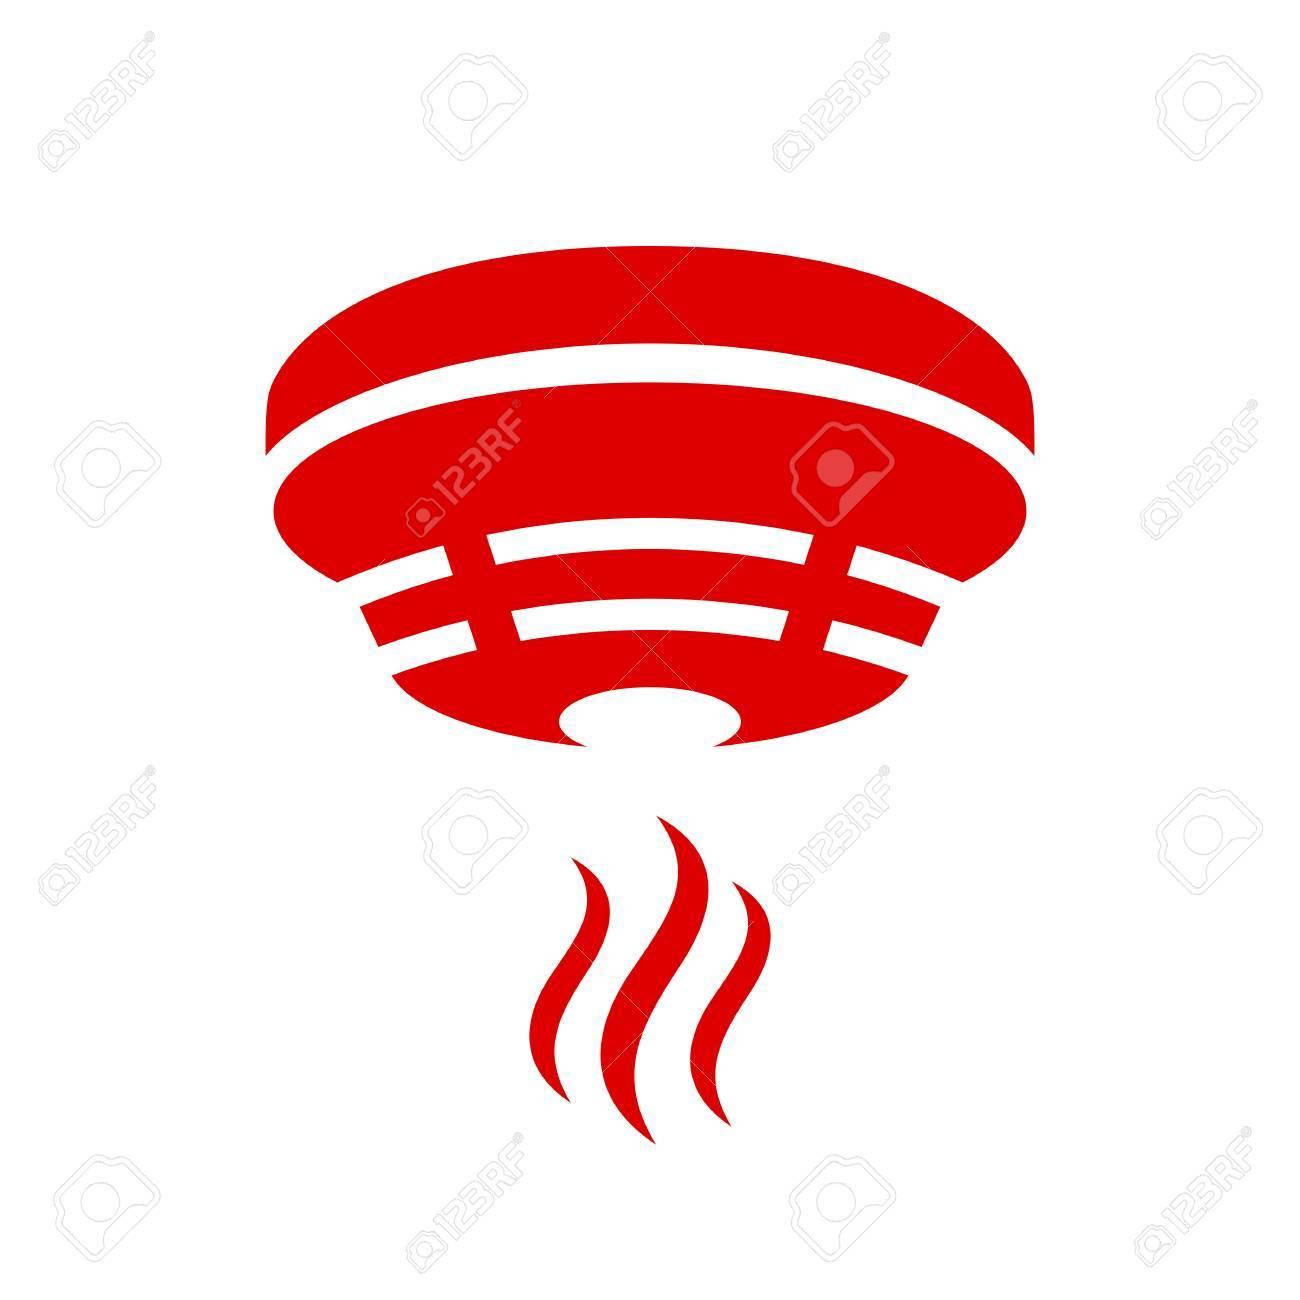 Smoke detector icon - 88450067